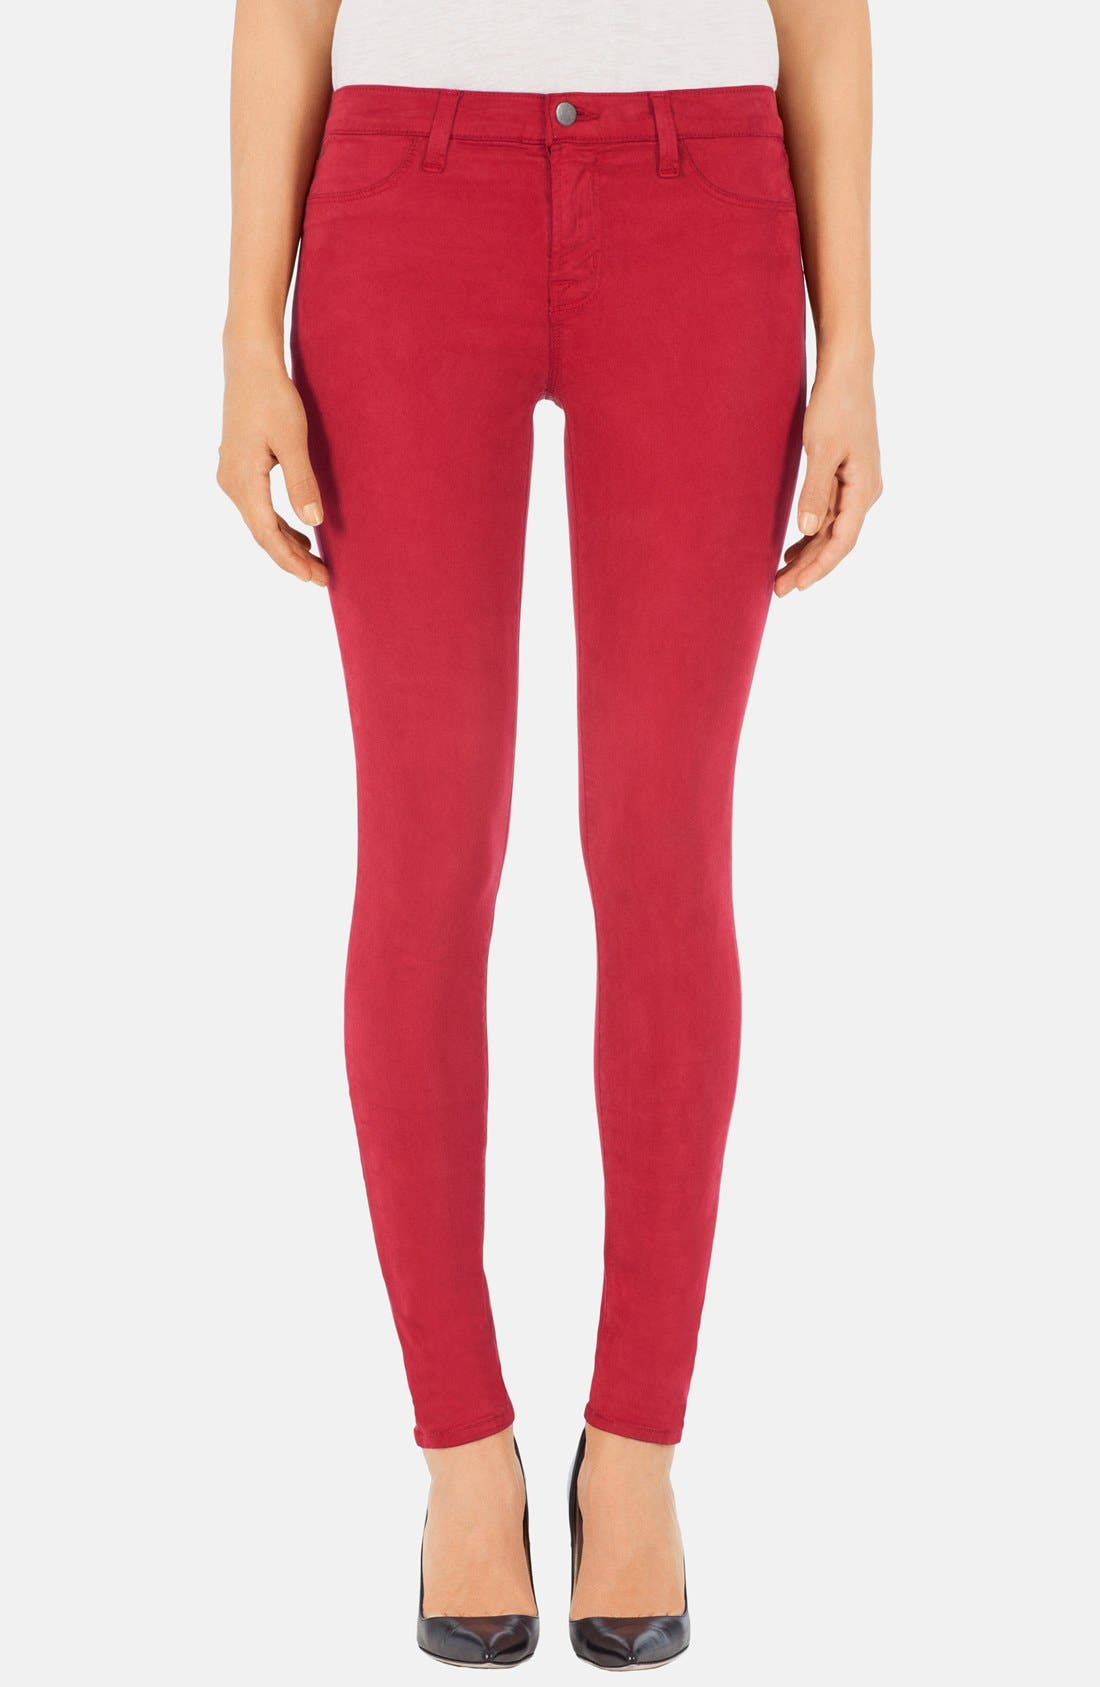 Alternate Image 1 Selected - J Brand '485' Mid Rise Super Skinny Jeans (Carnelian)